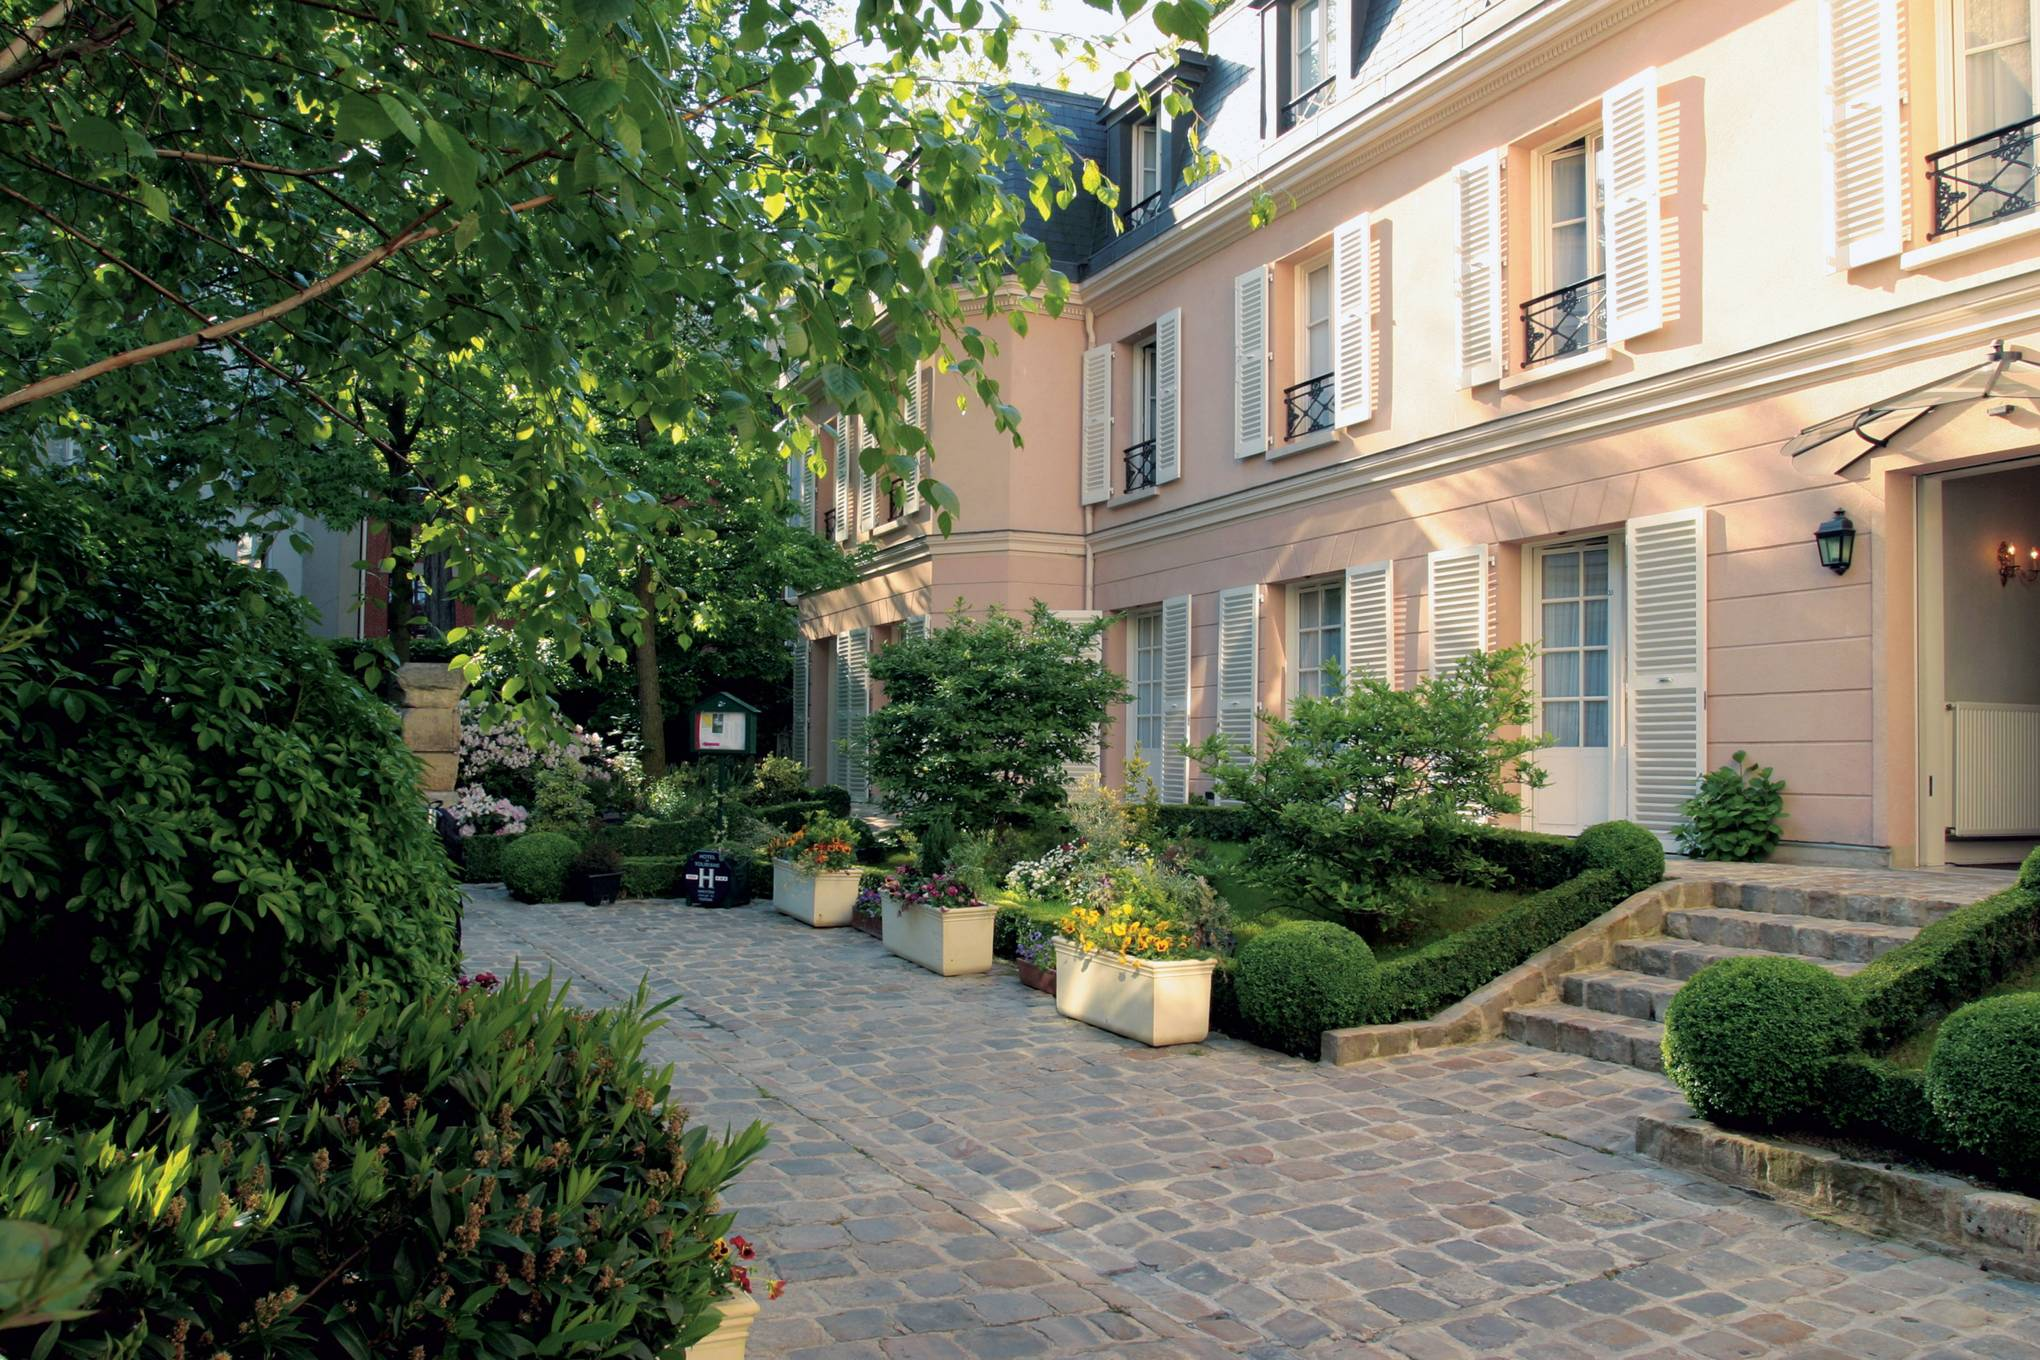 Hotel Villa La Parisienne Parigi stylish and affordable hotels in paris | cn traveller